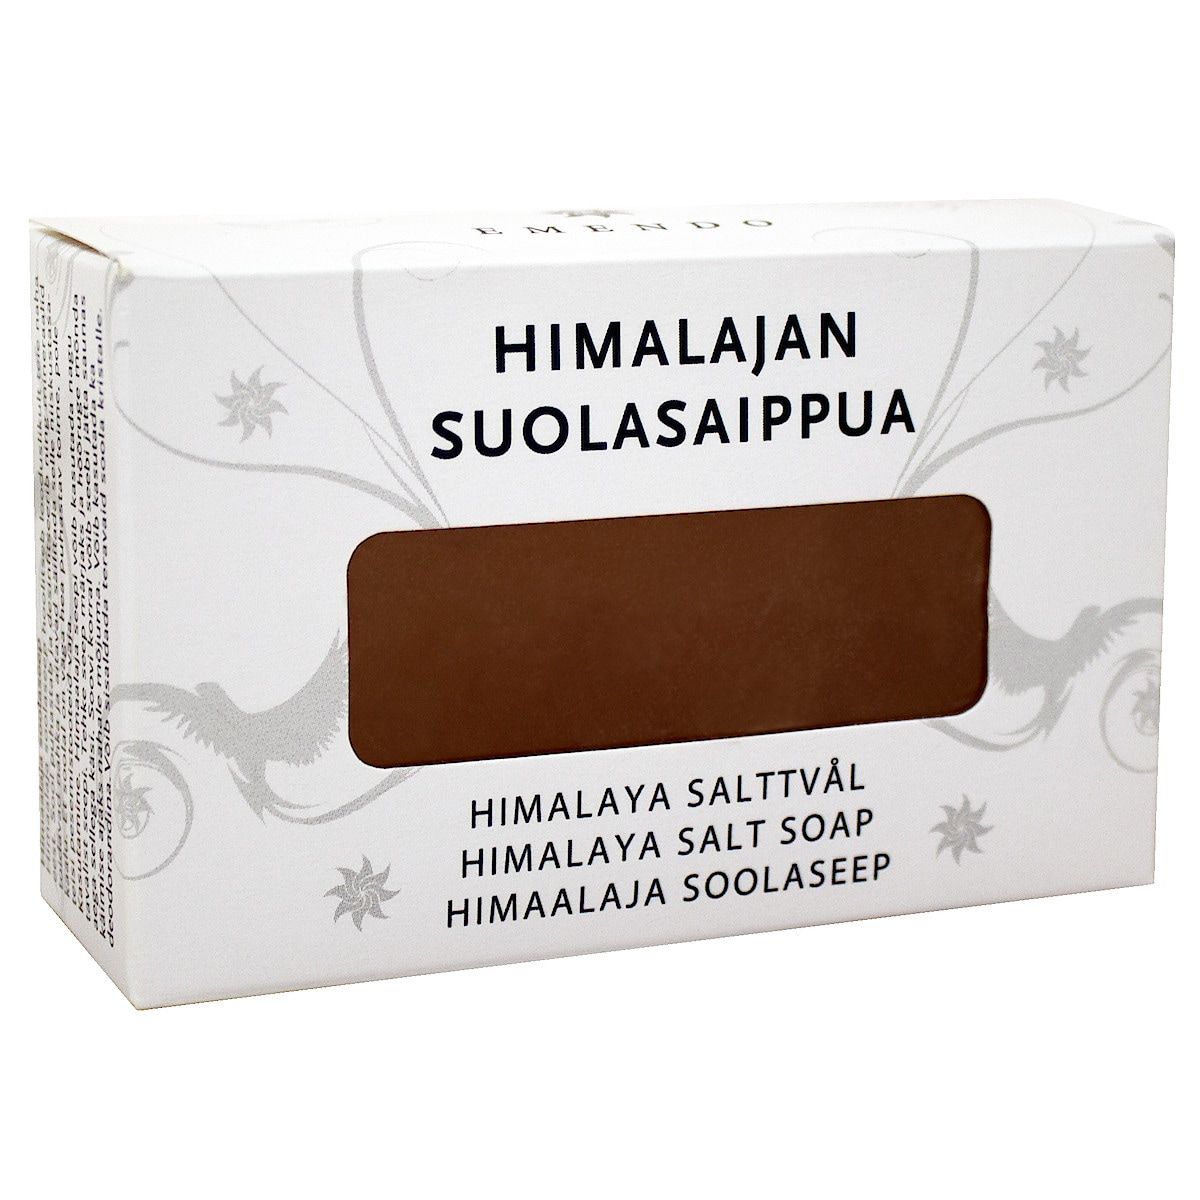 Salttvål Himalaya Emendo